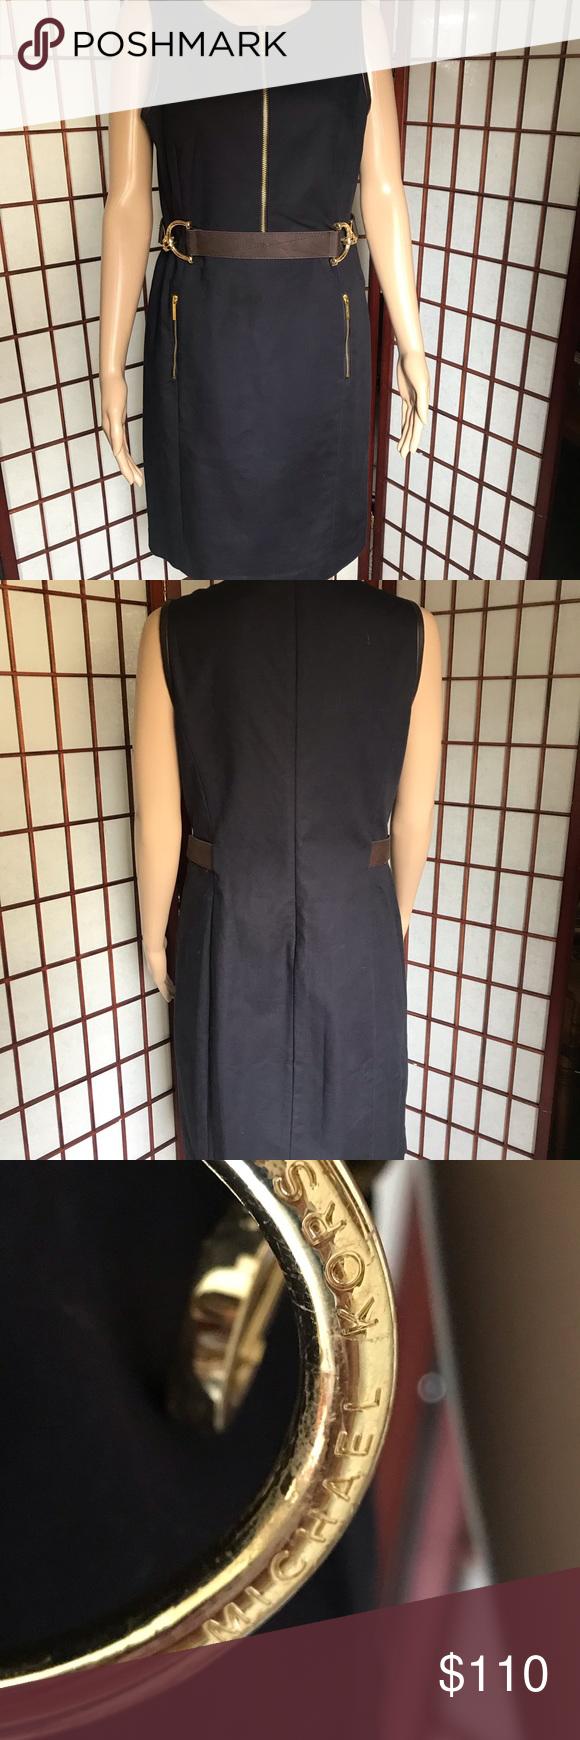 EUC Michael Kors Dress with Italian Leather Trim This ...